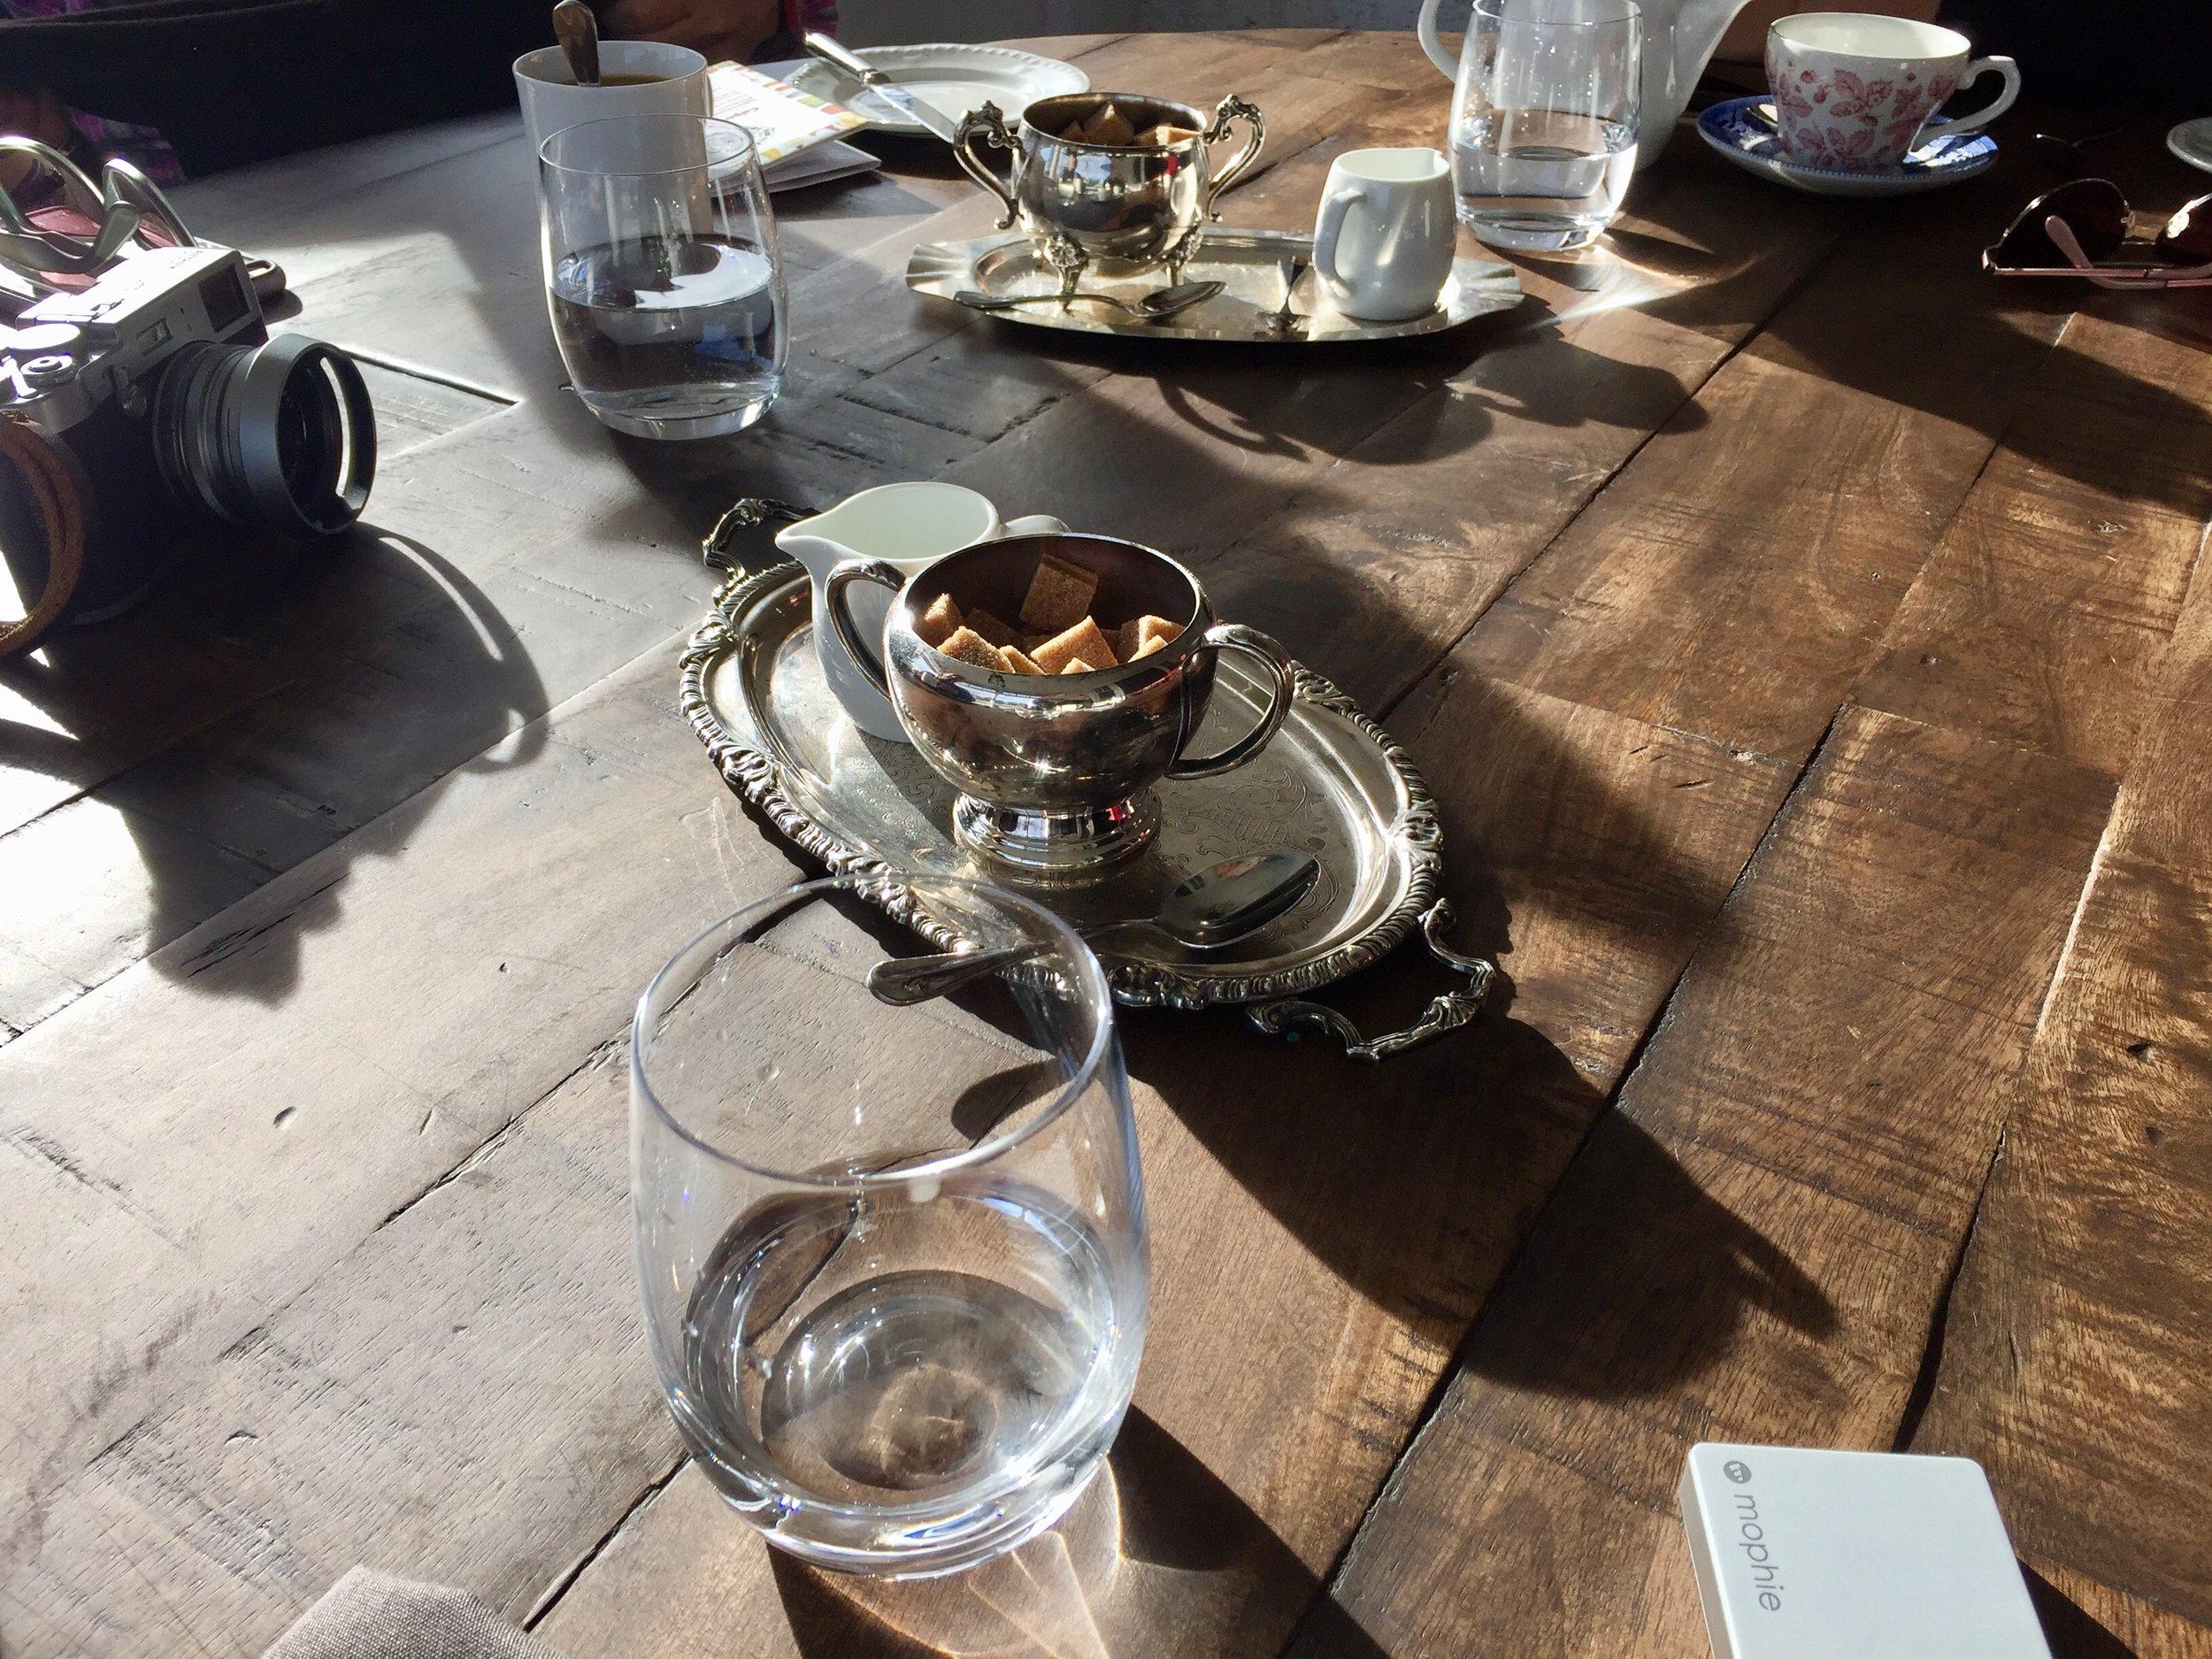 3-dessert-and-coffee-at-deane-house-in-calgary_29949858723_o.jpg